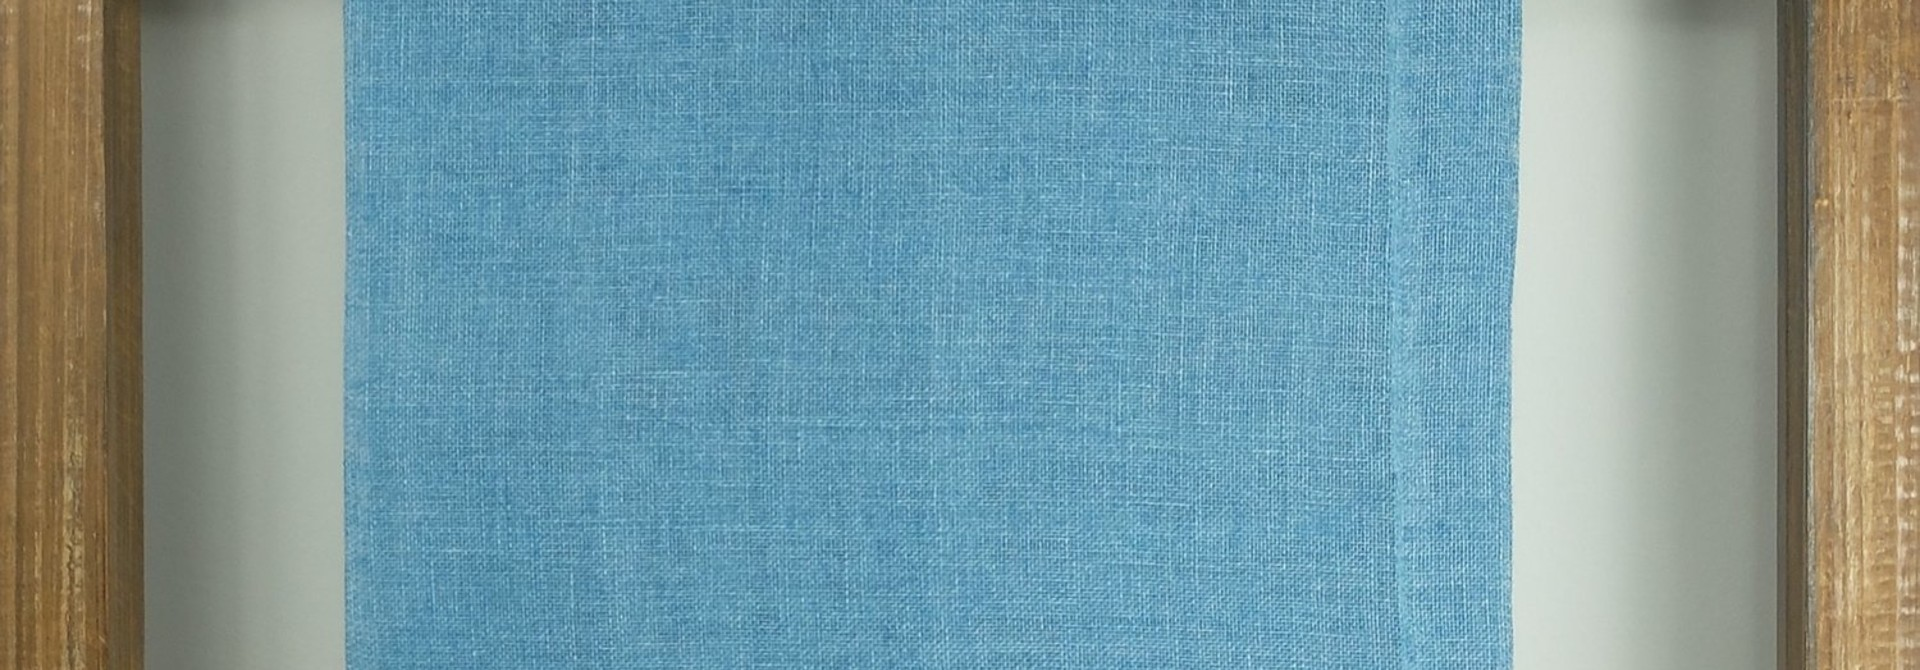 Table Runner - Fjord - Reef Blue